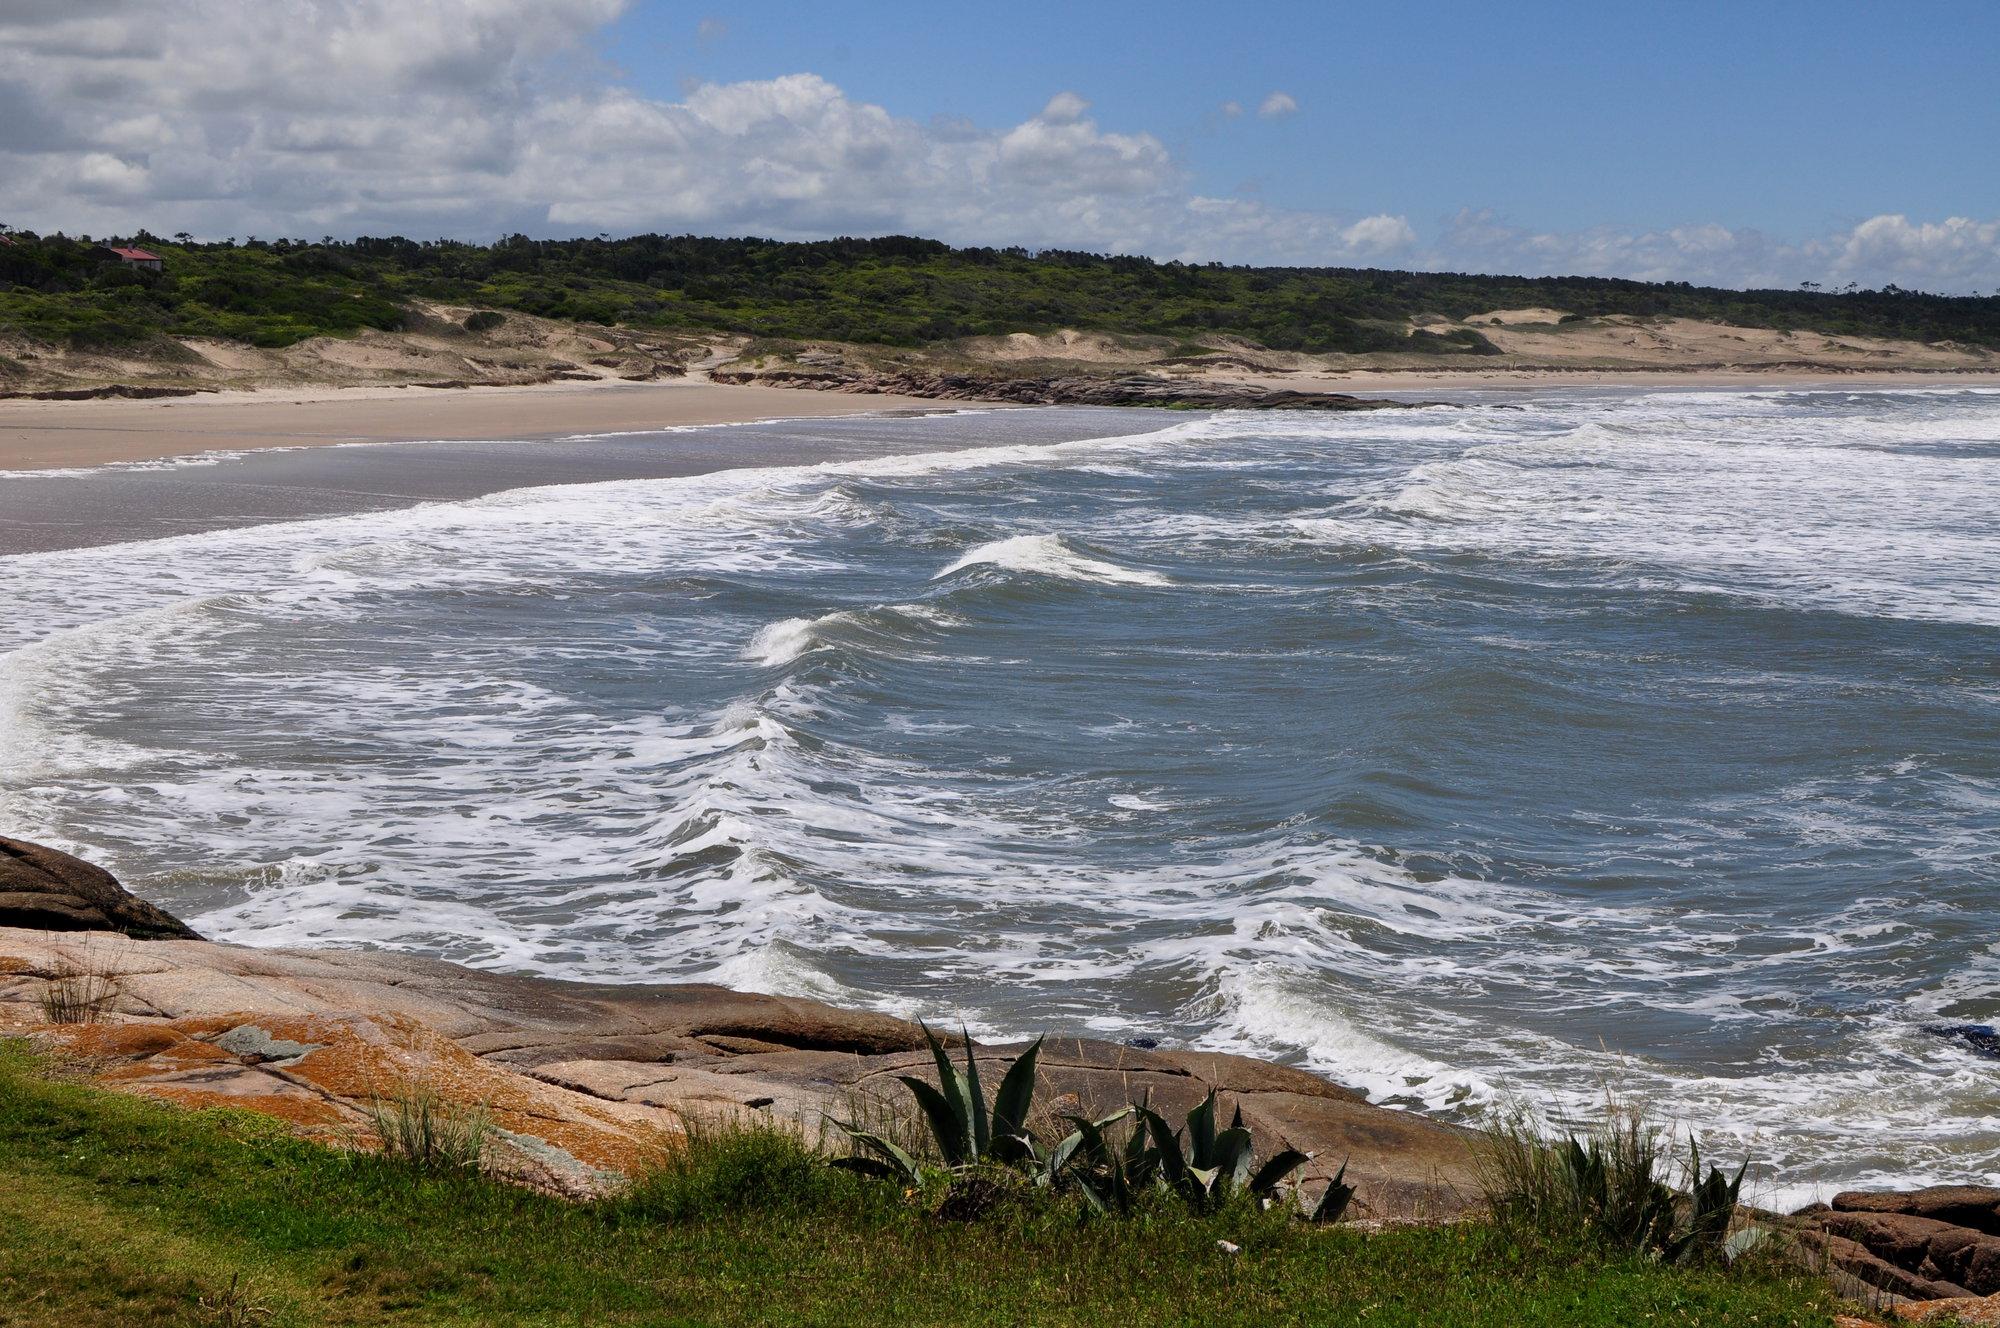 Playa de la Moza